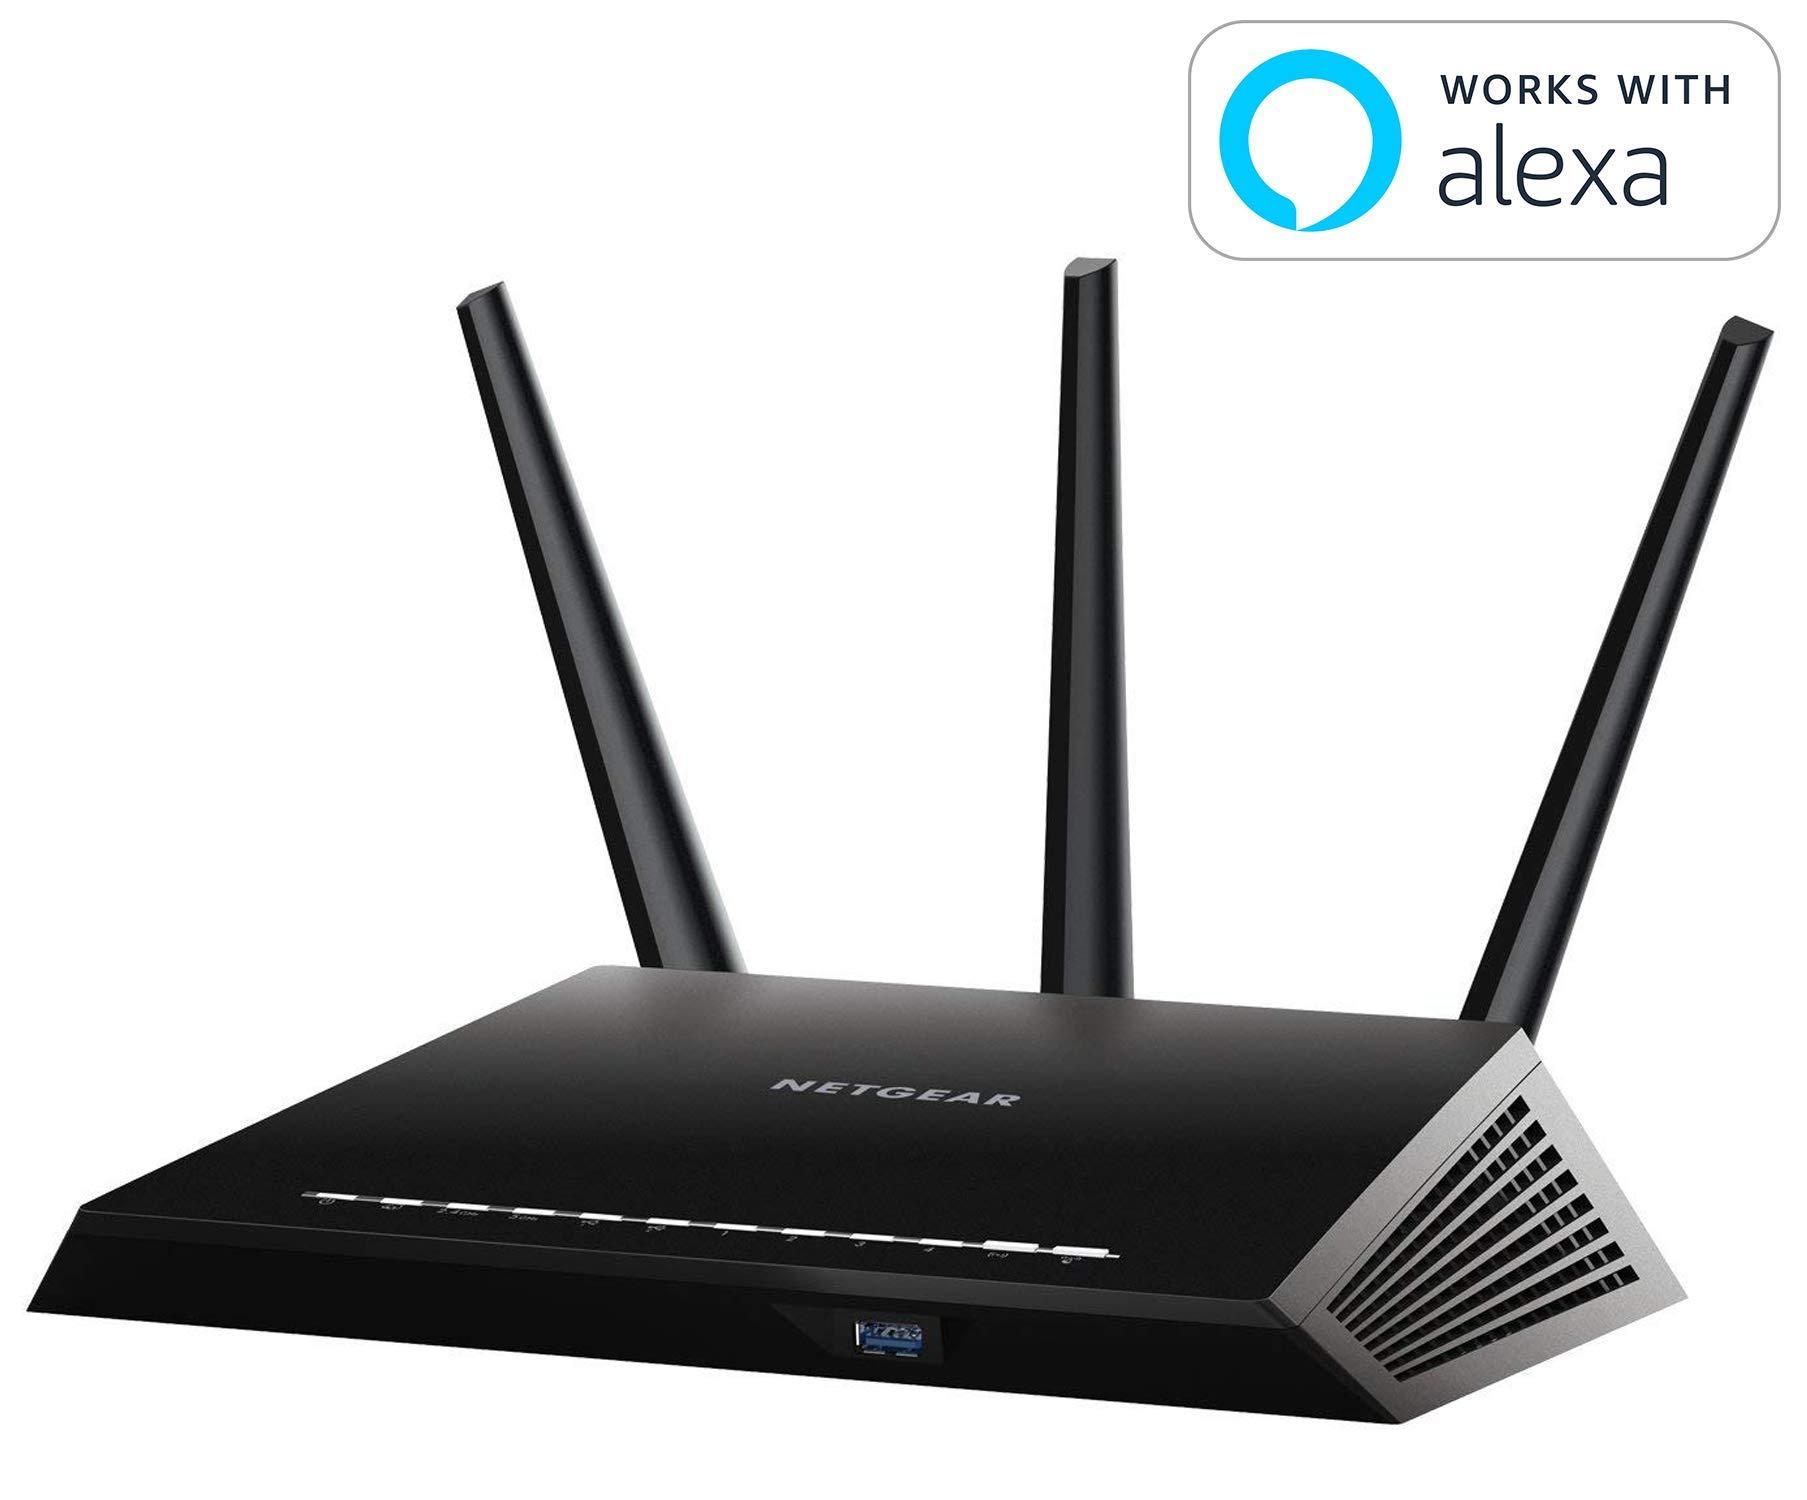 NETGEAR Nighthawk AC1900 Dual Band WiFi Router, MU-MIMO, Circle with Disney Smart Parental Controls (R6900P)